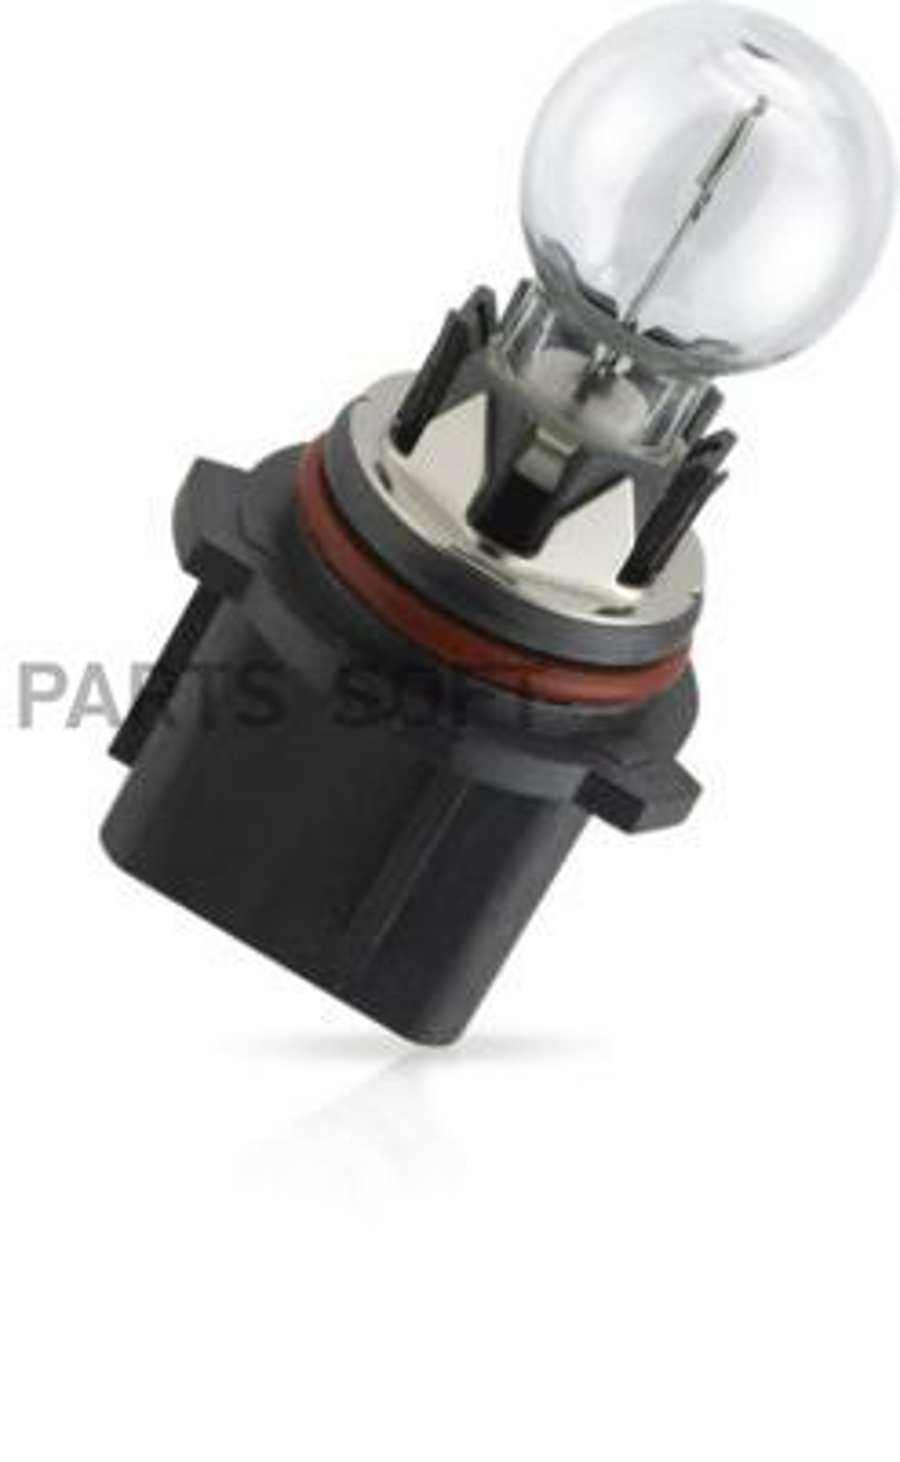 Лампа P13W Vision 12V 13W PG18.5d-1 C1